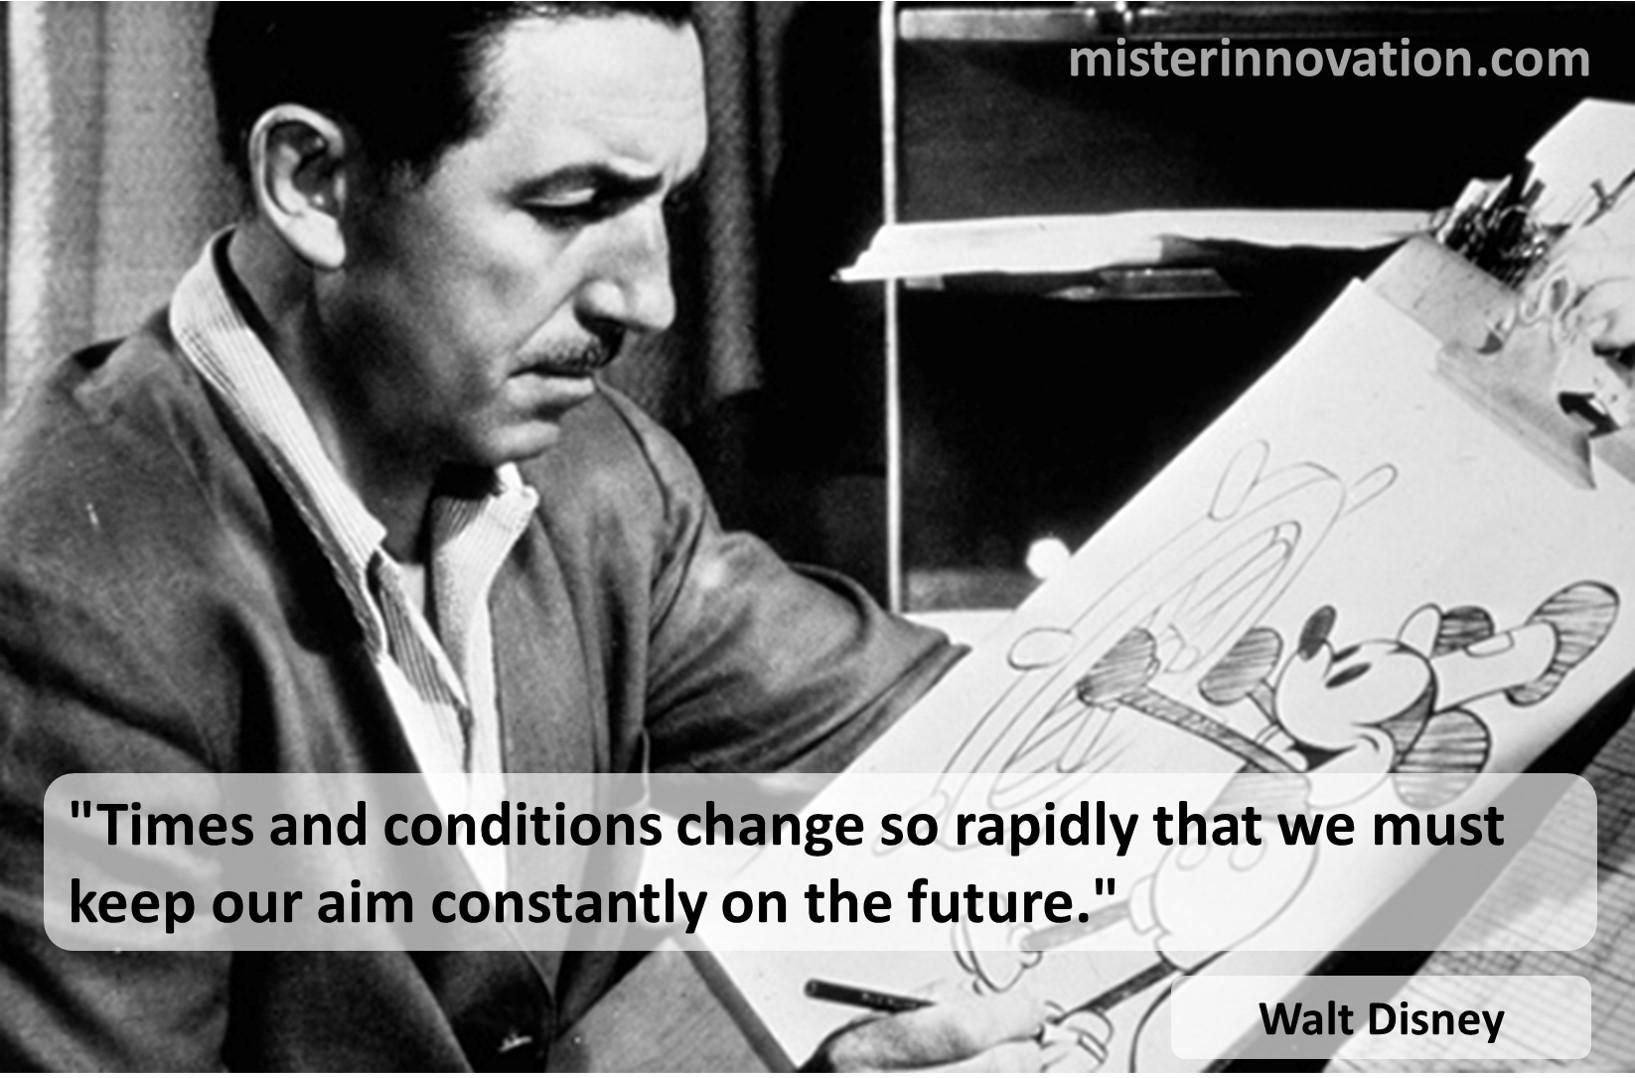 Walt Disney Change Future